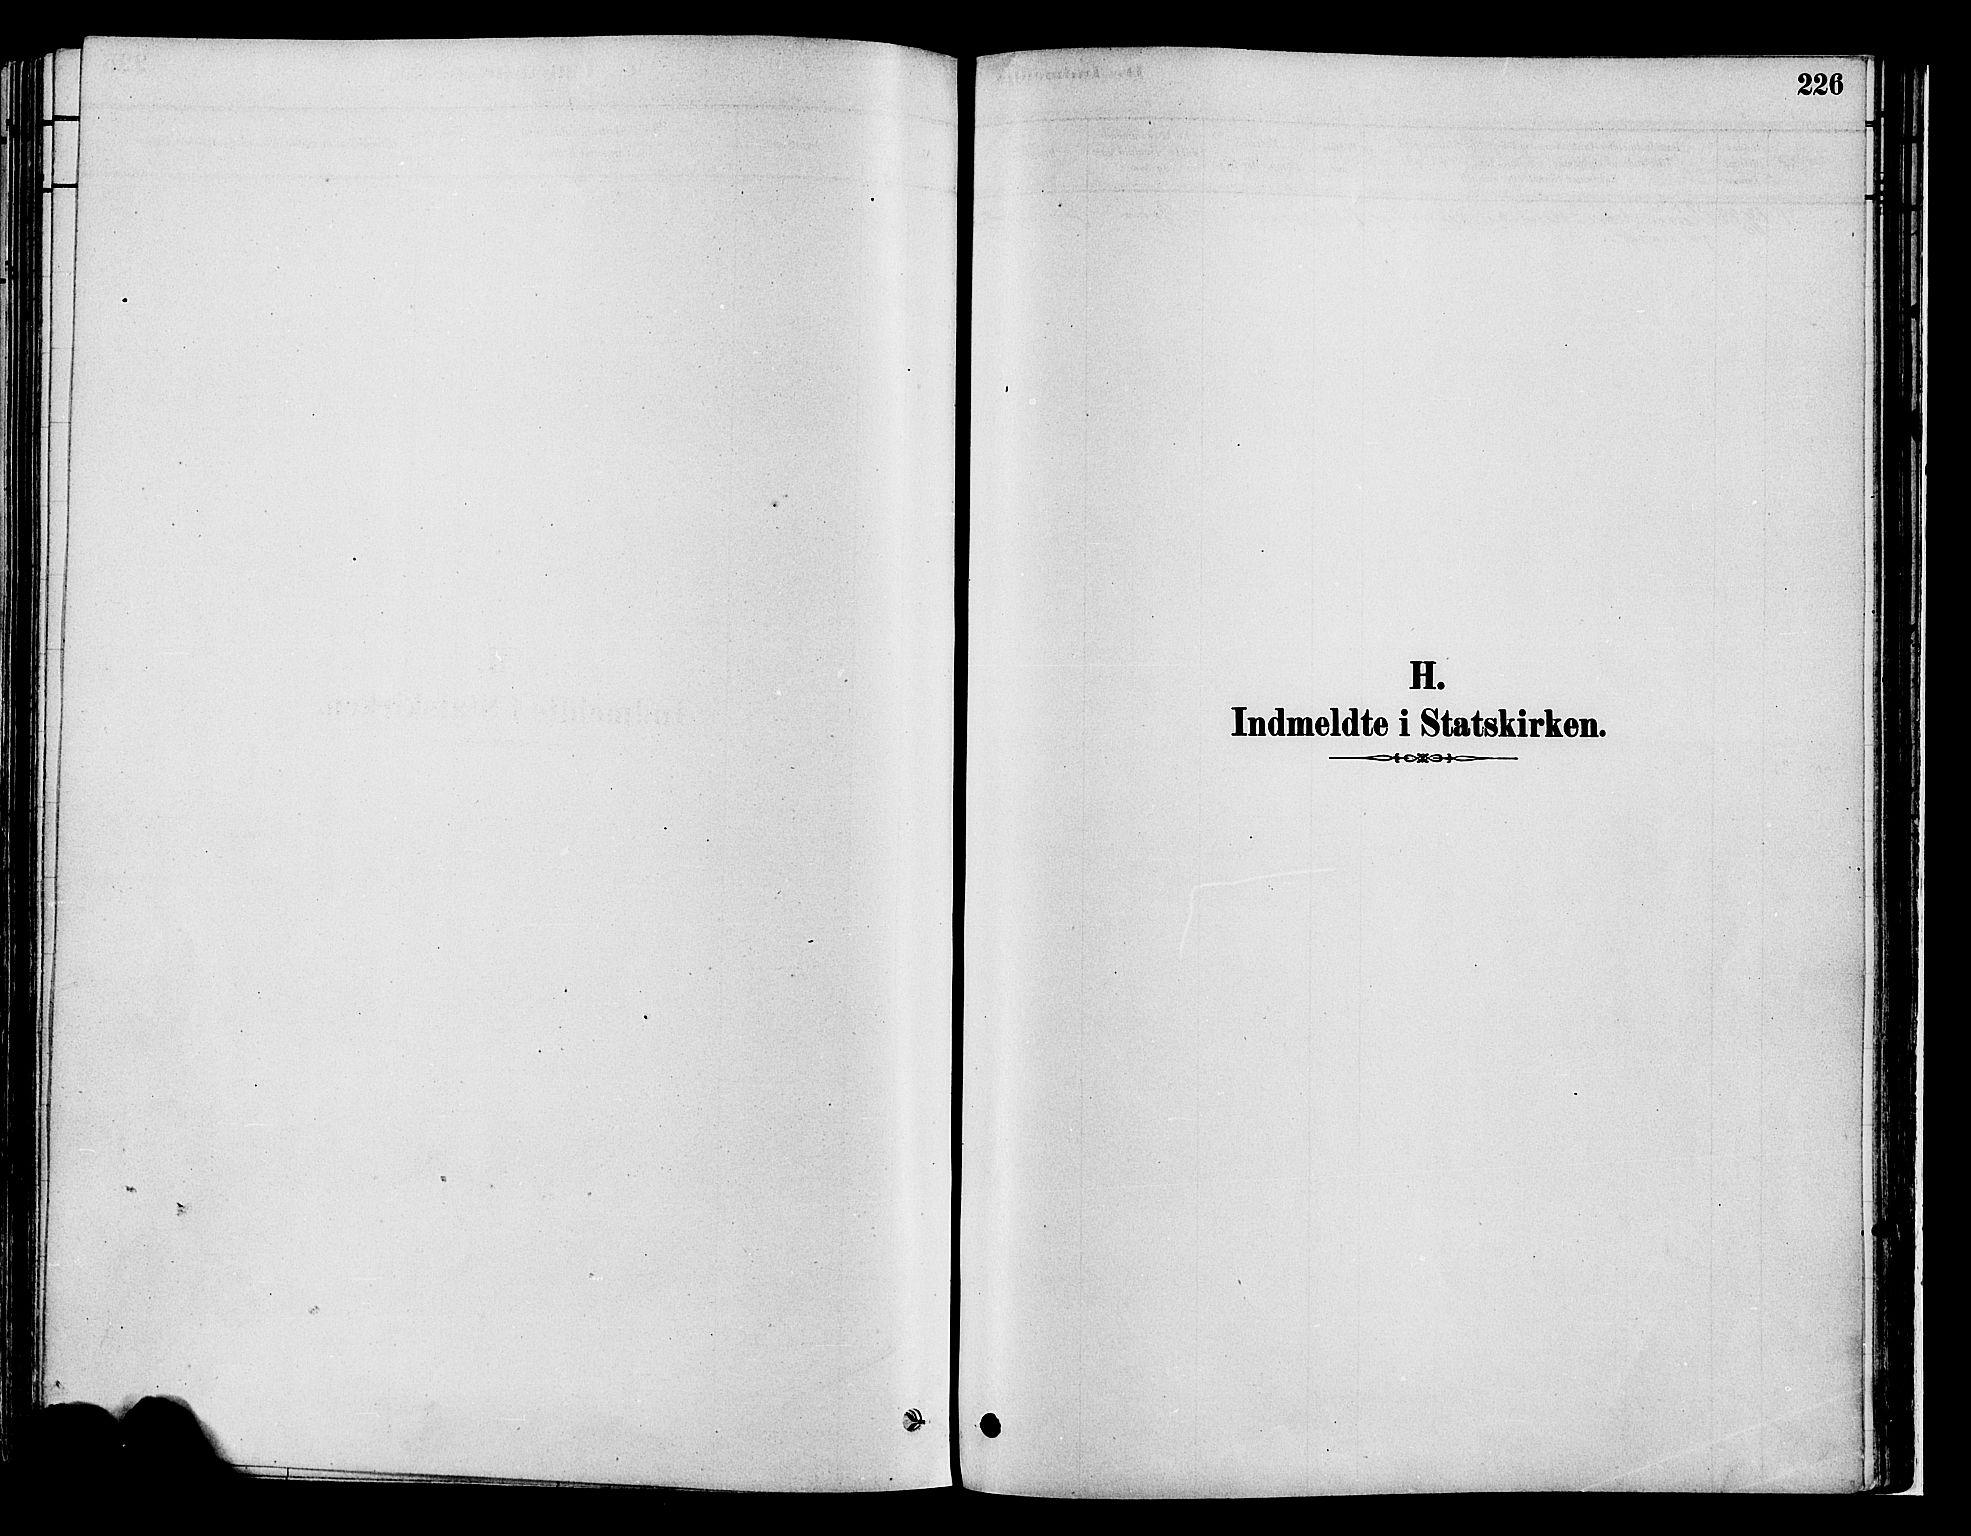 SAH, Gran prestekontor, Ministerialbok nr. 14, 1880-1889, s. 226